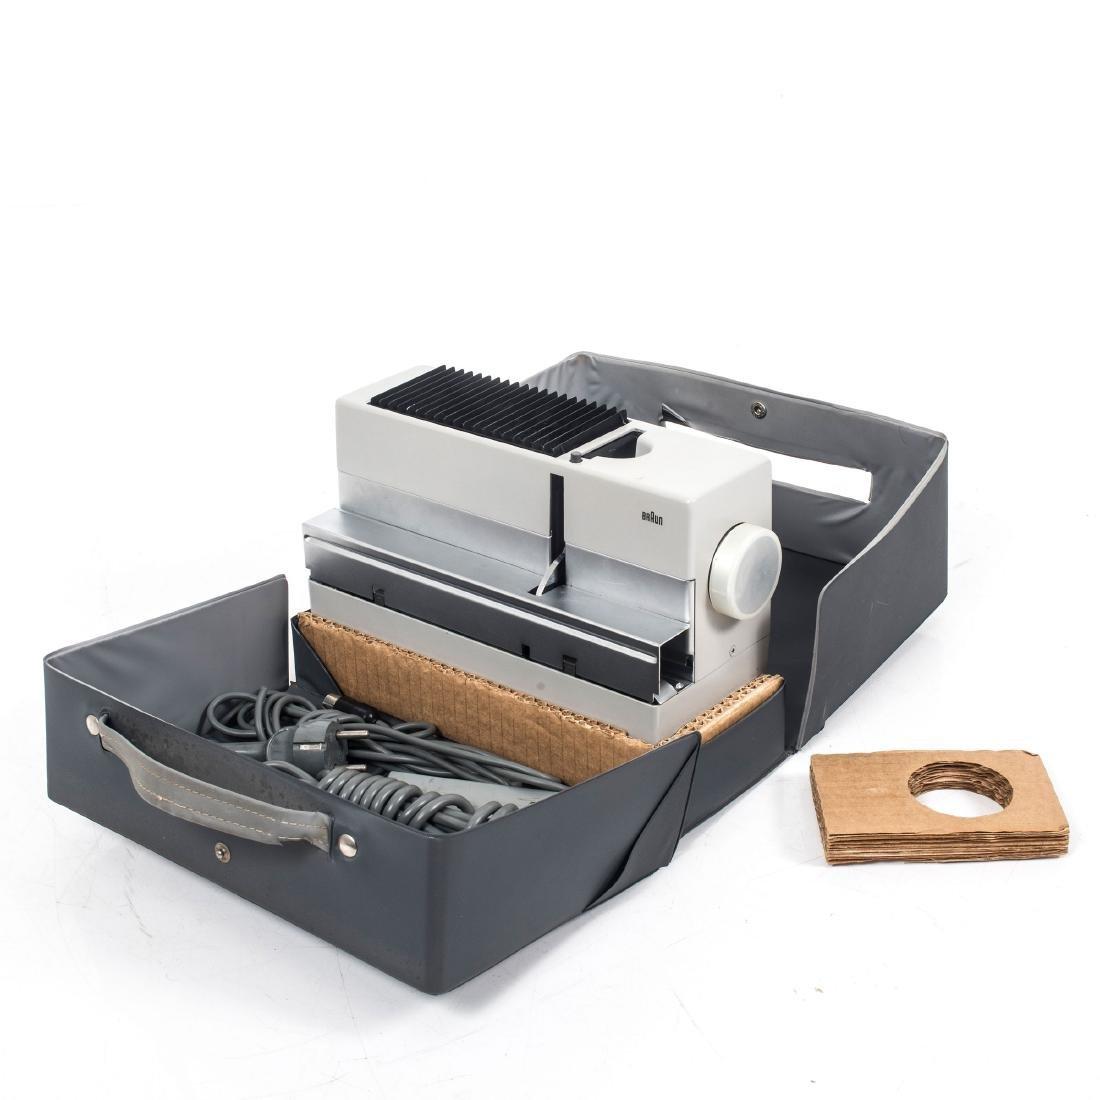 'D 40' slide projector, 1961 - 2